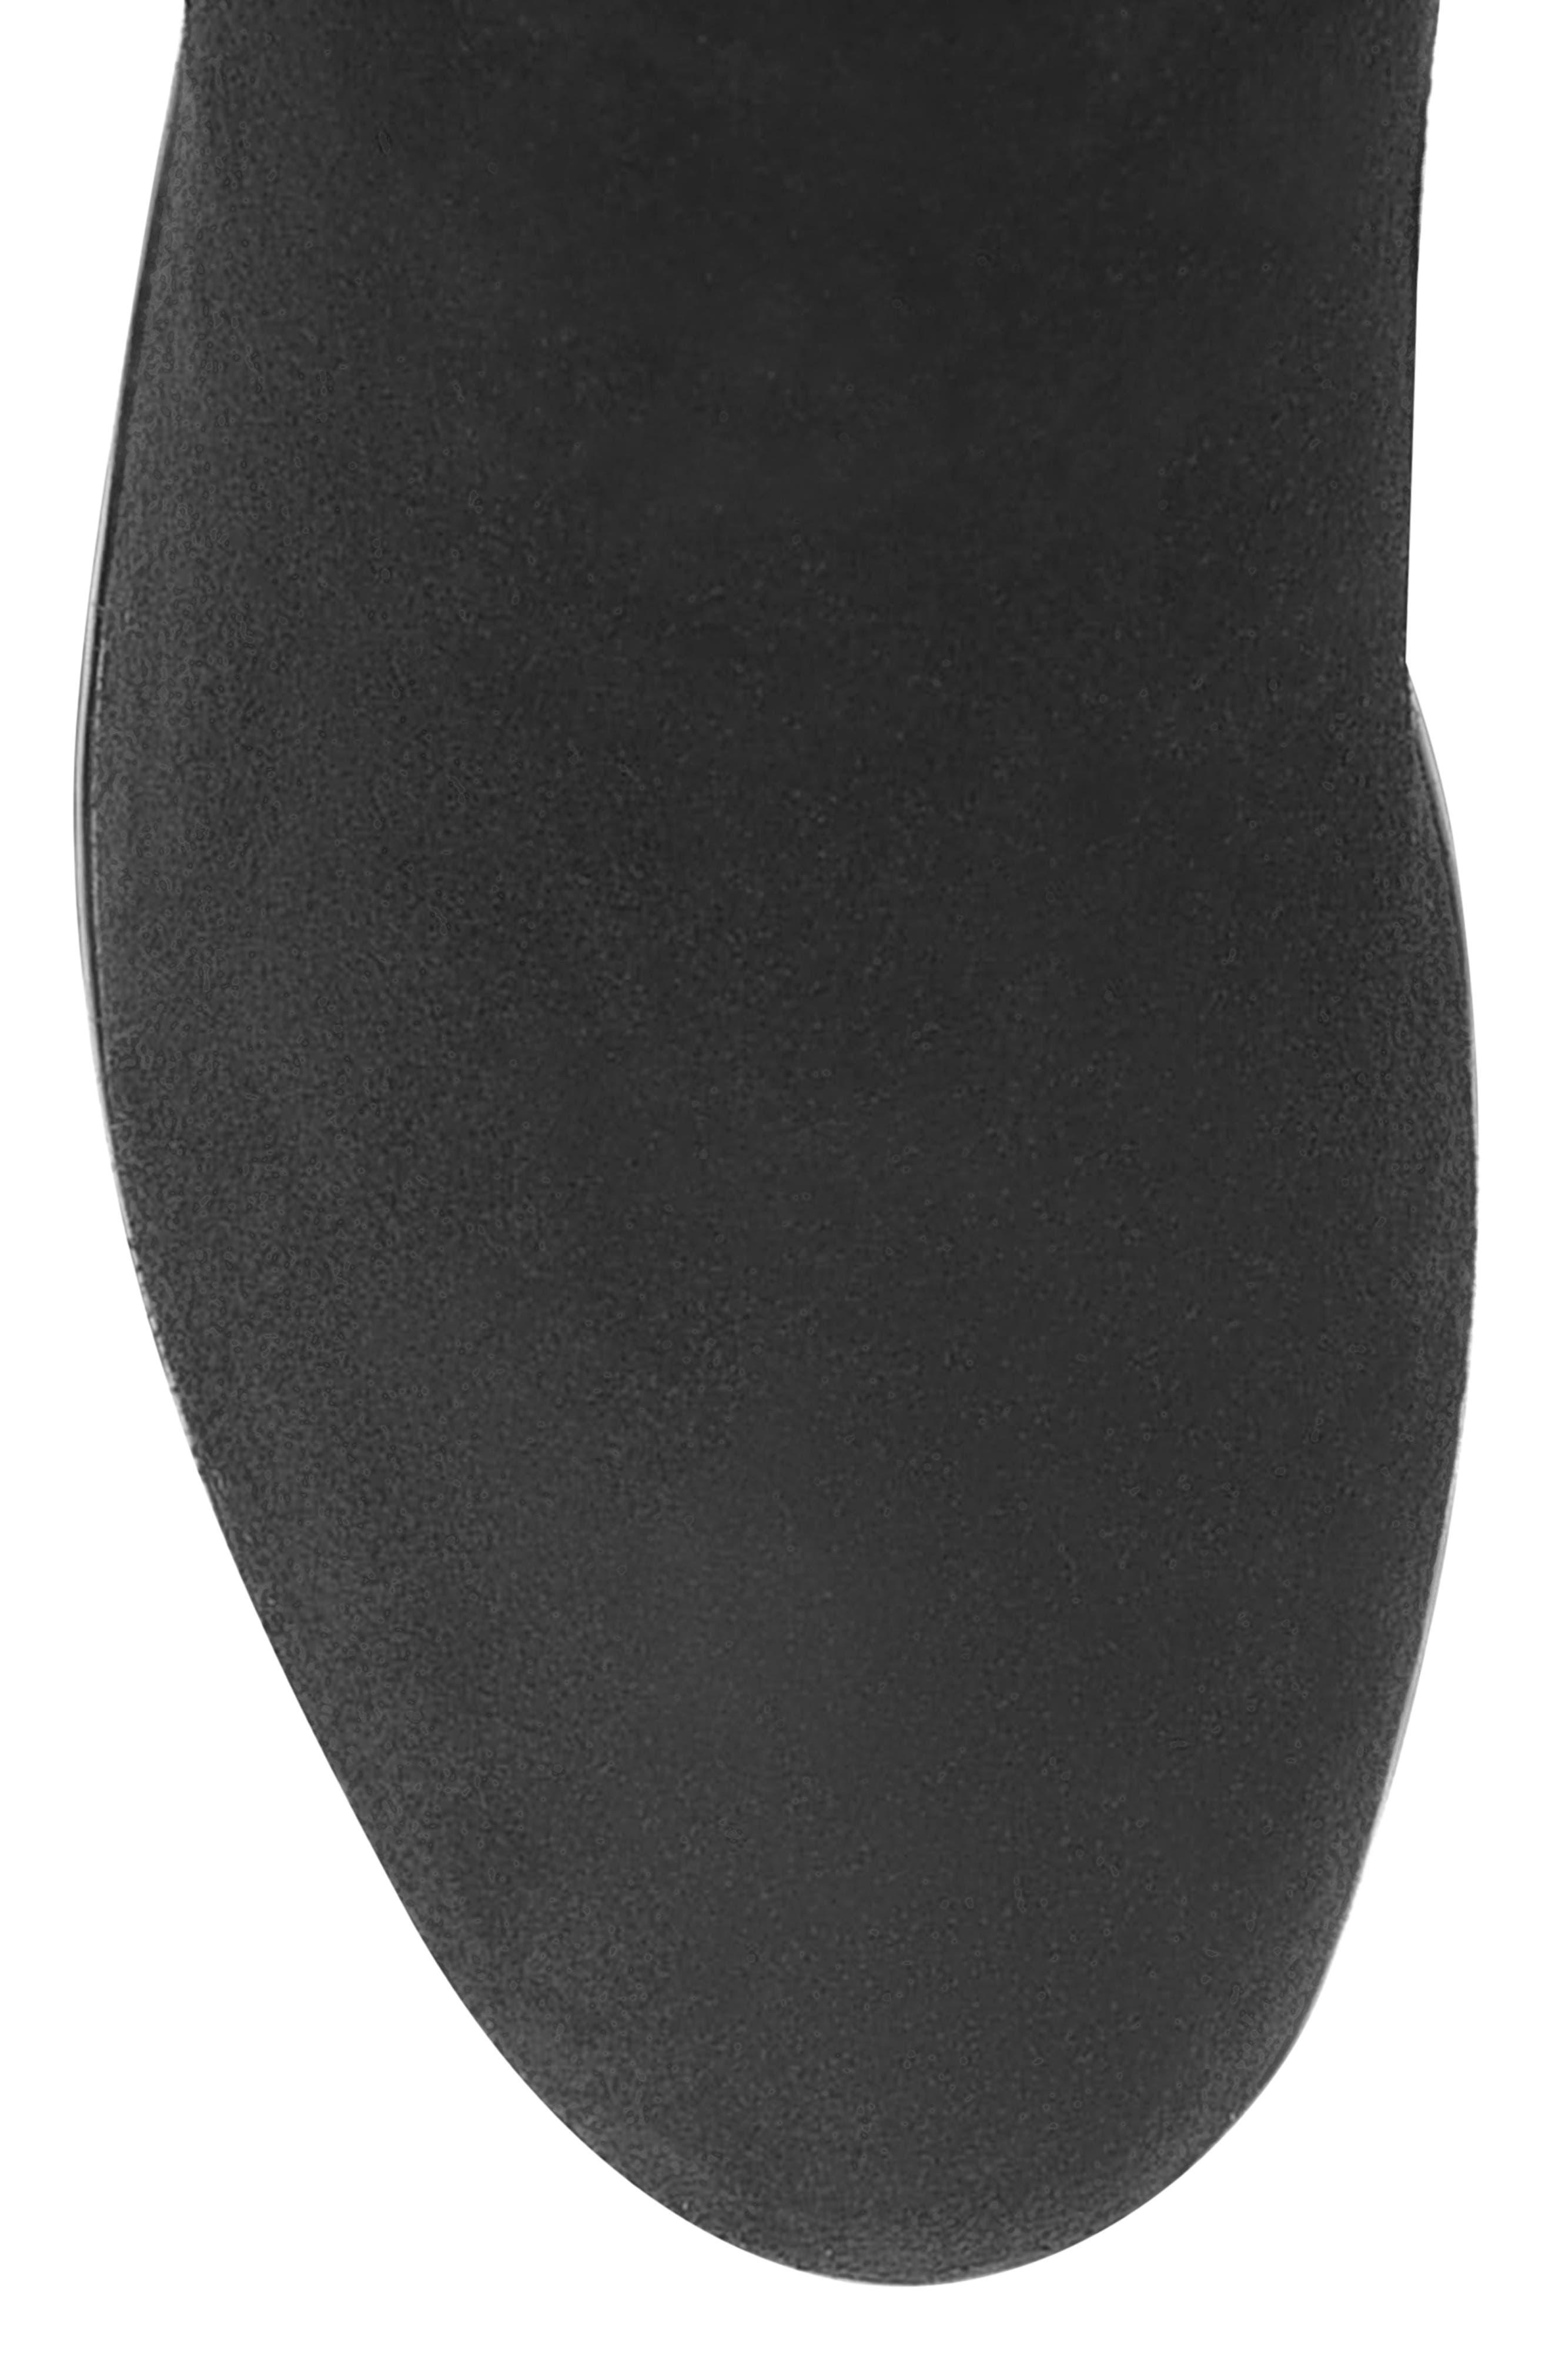 BLONDO, Larissa Waterproof Wedge Knee High Boot, Alternate thumbnail 4, color, BLACK SUEDE